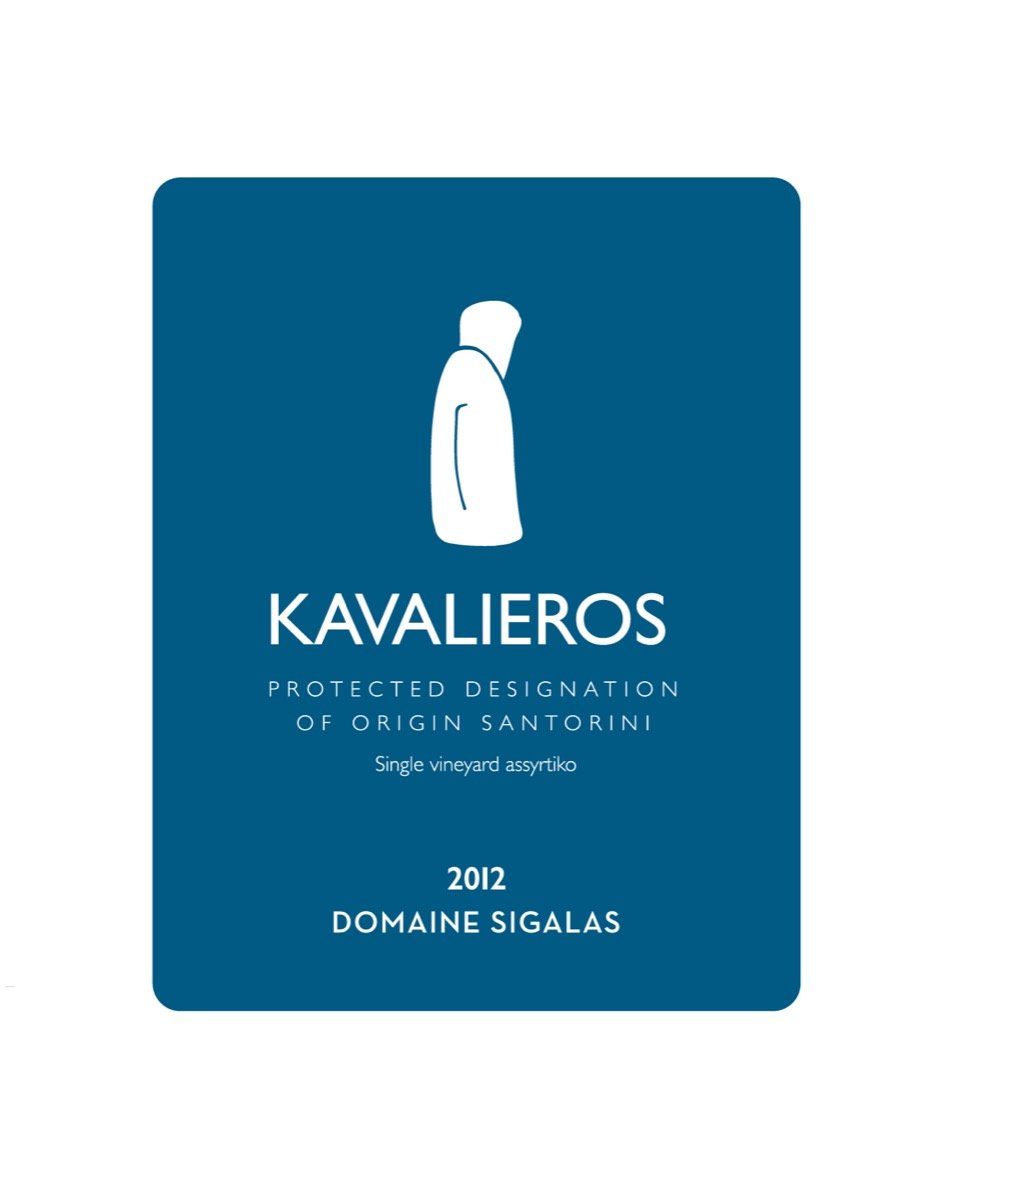 KABALIEROS FRONT 2012